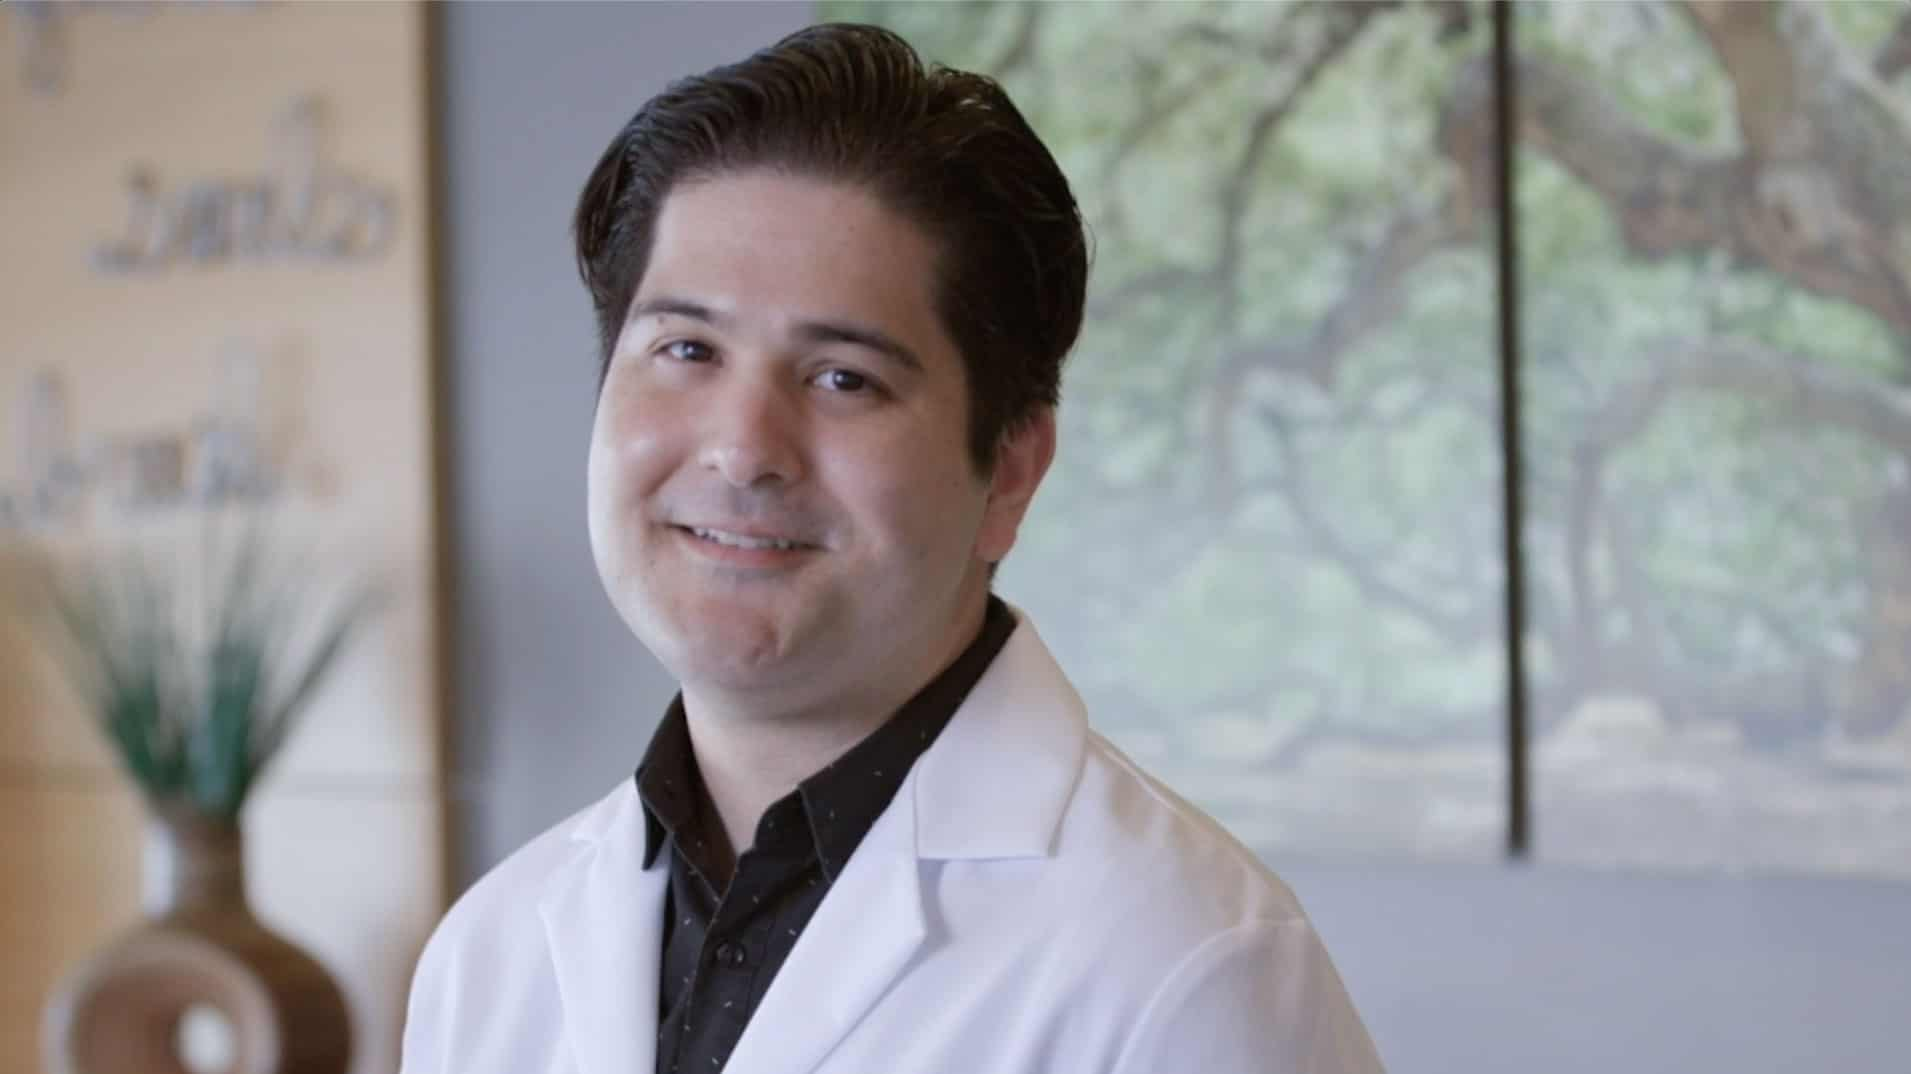 Dr. Peter Villadiego